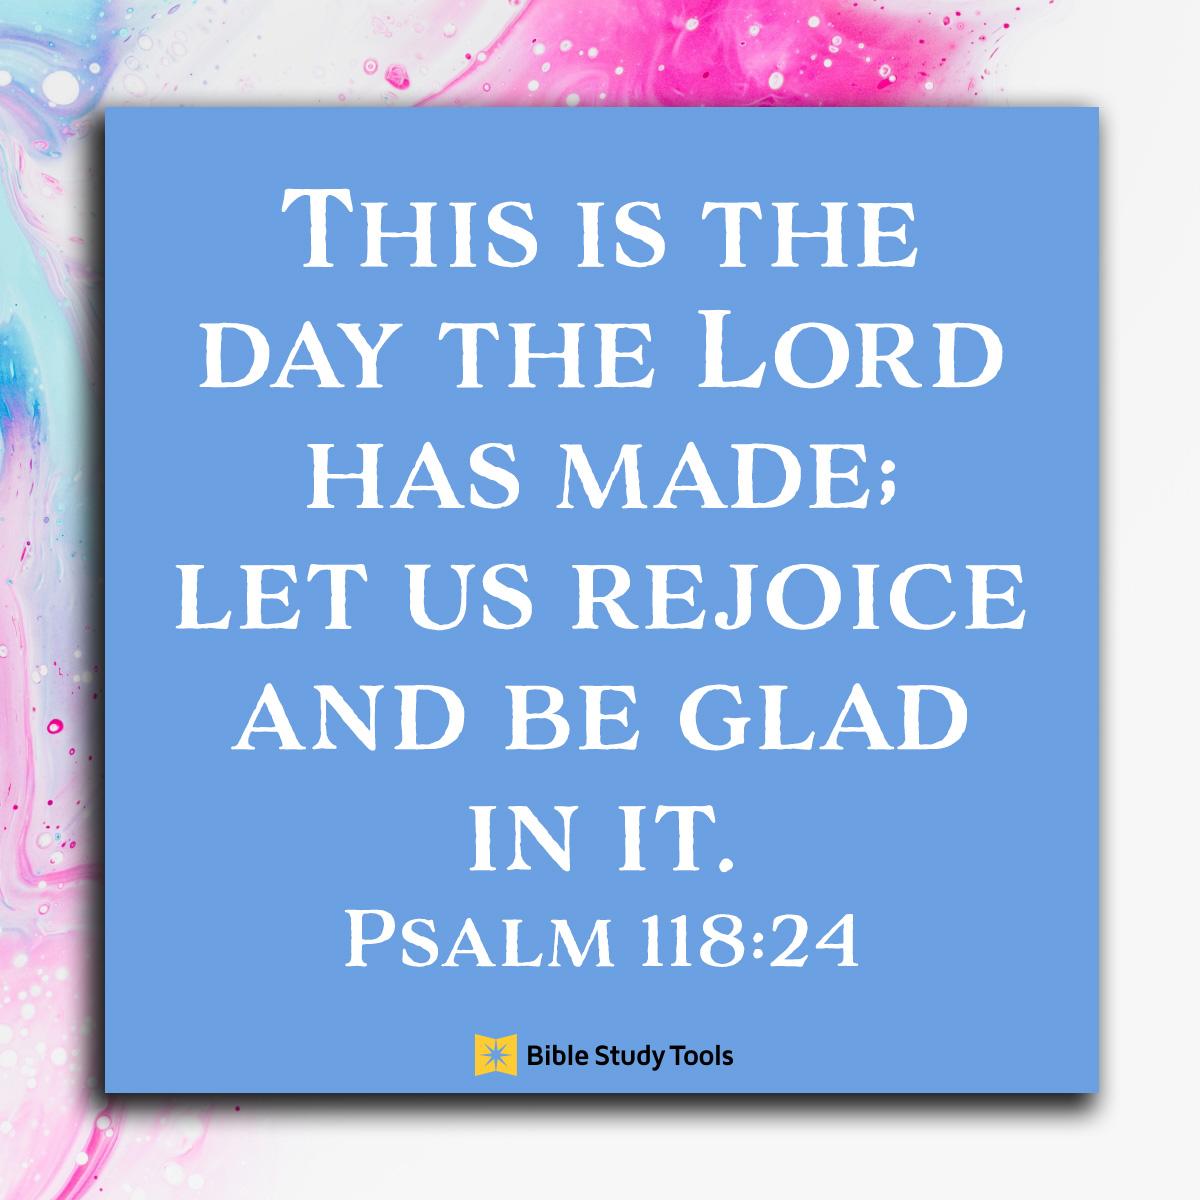 Psalm 118:24, inspirational image